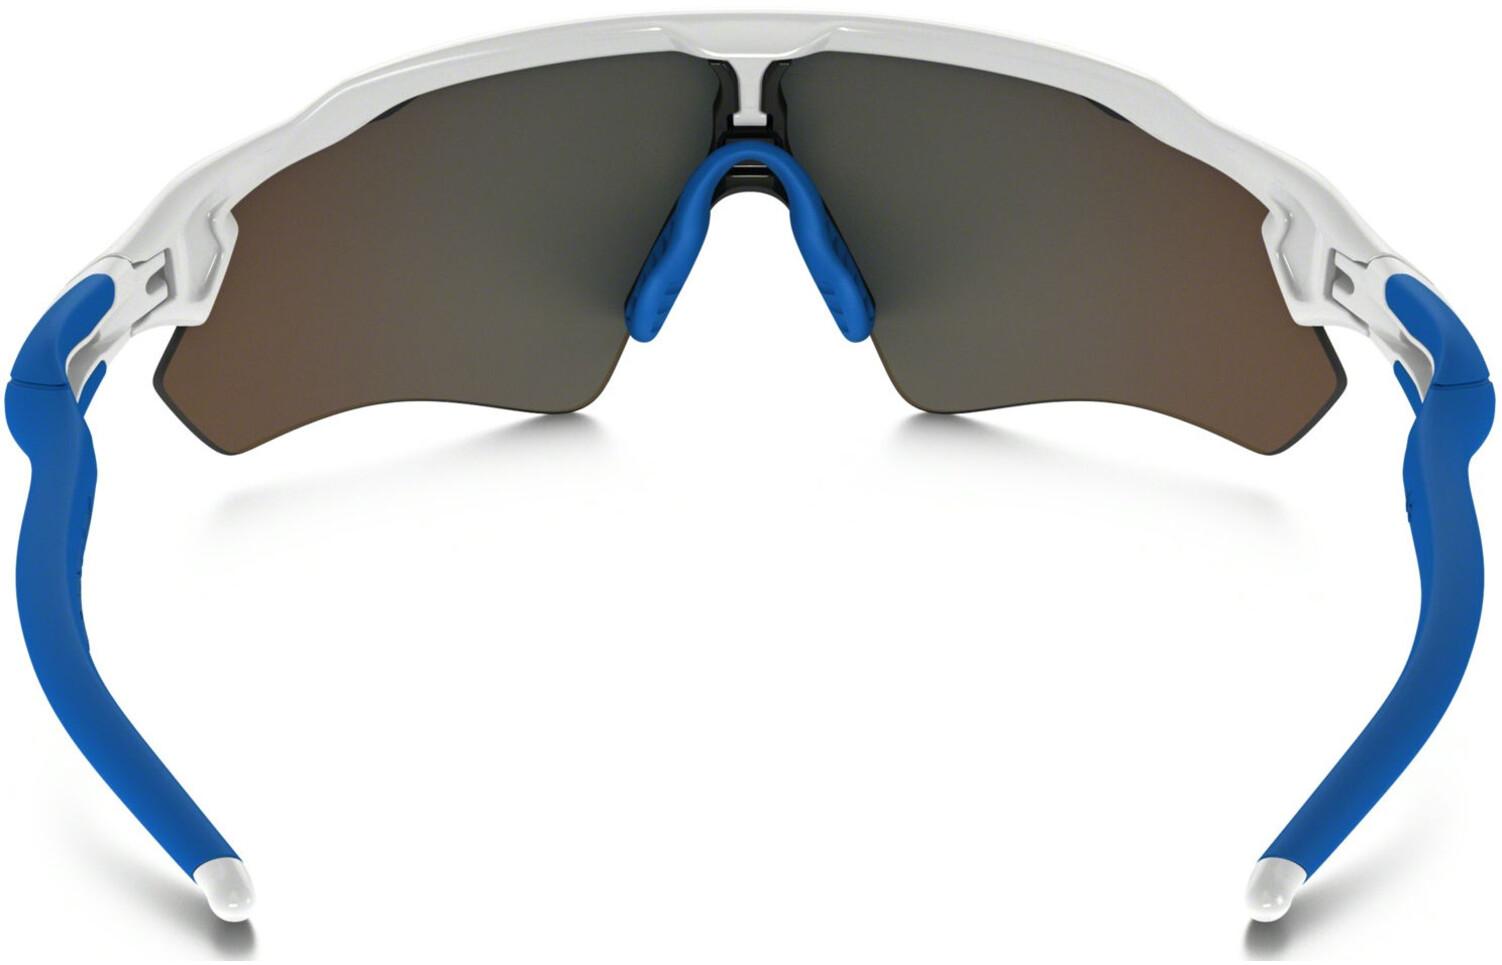 Oakley Radar EV XS Path - Lunettes cyclisme - bleu blanc - Boutique ... 5ae3ef52df59